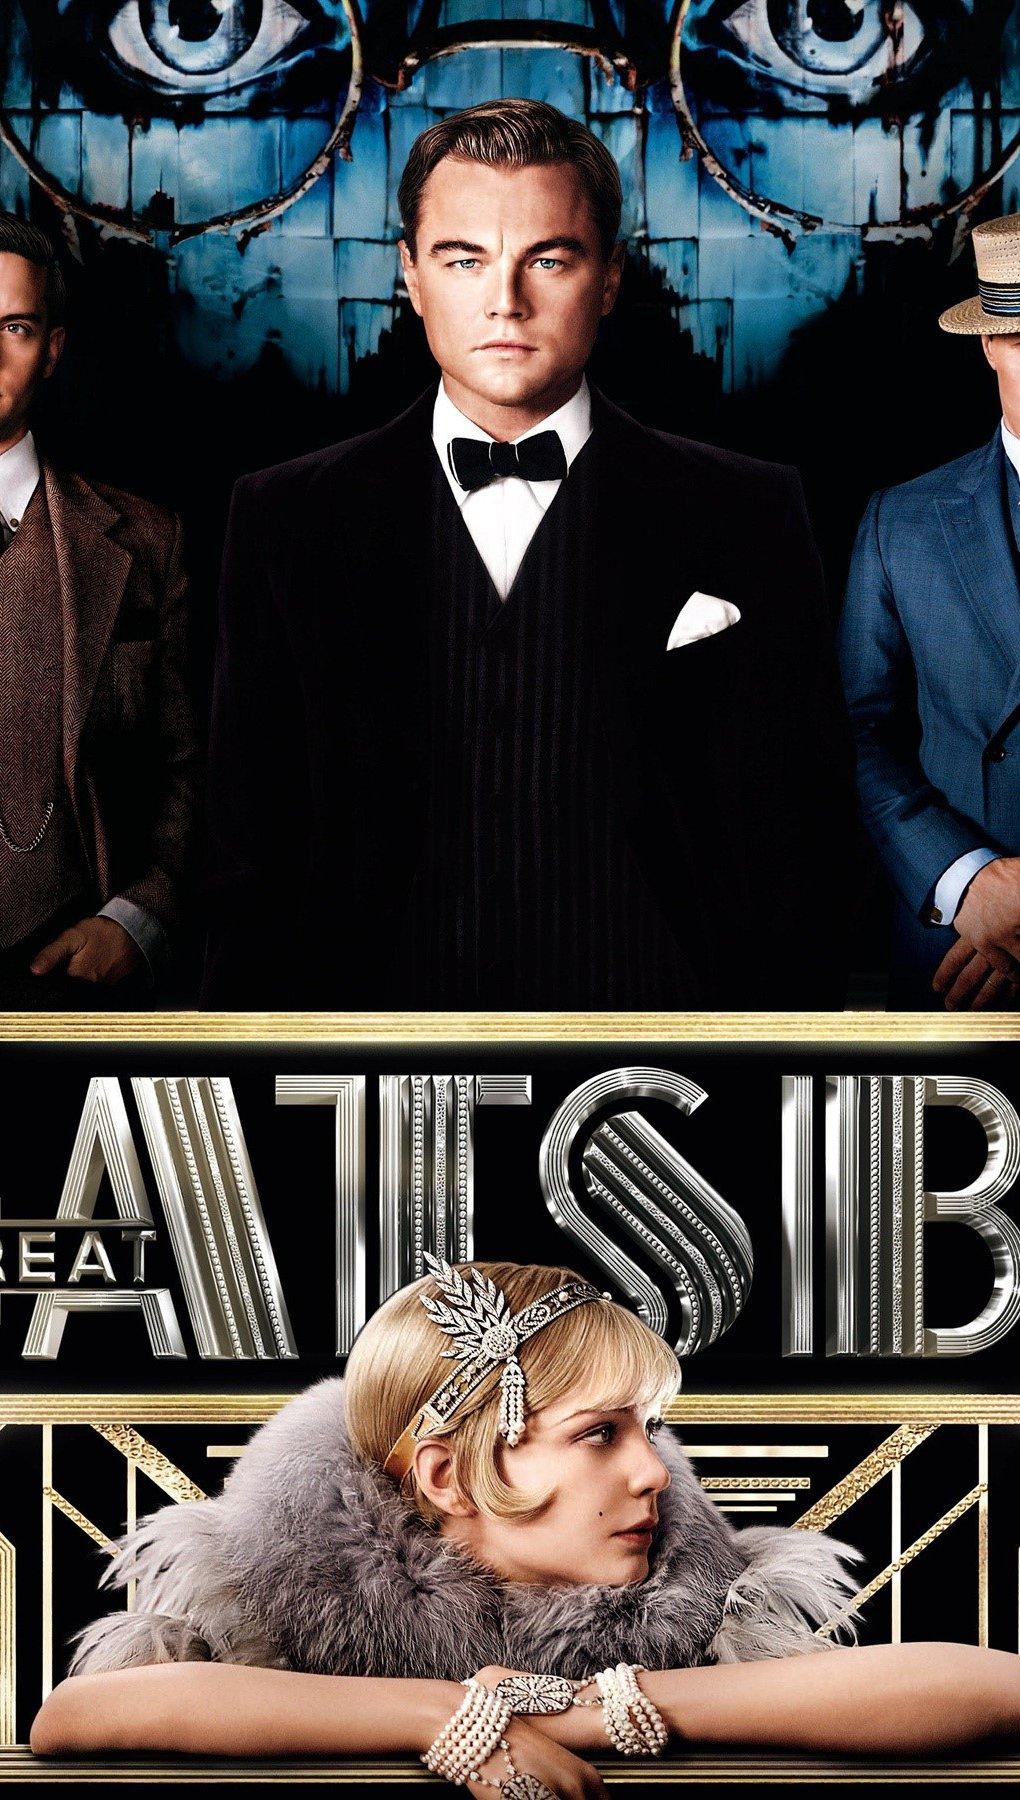 Fondos de pantalla Película El gran Gatsby Vertical